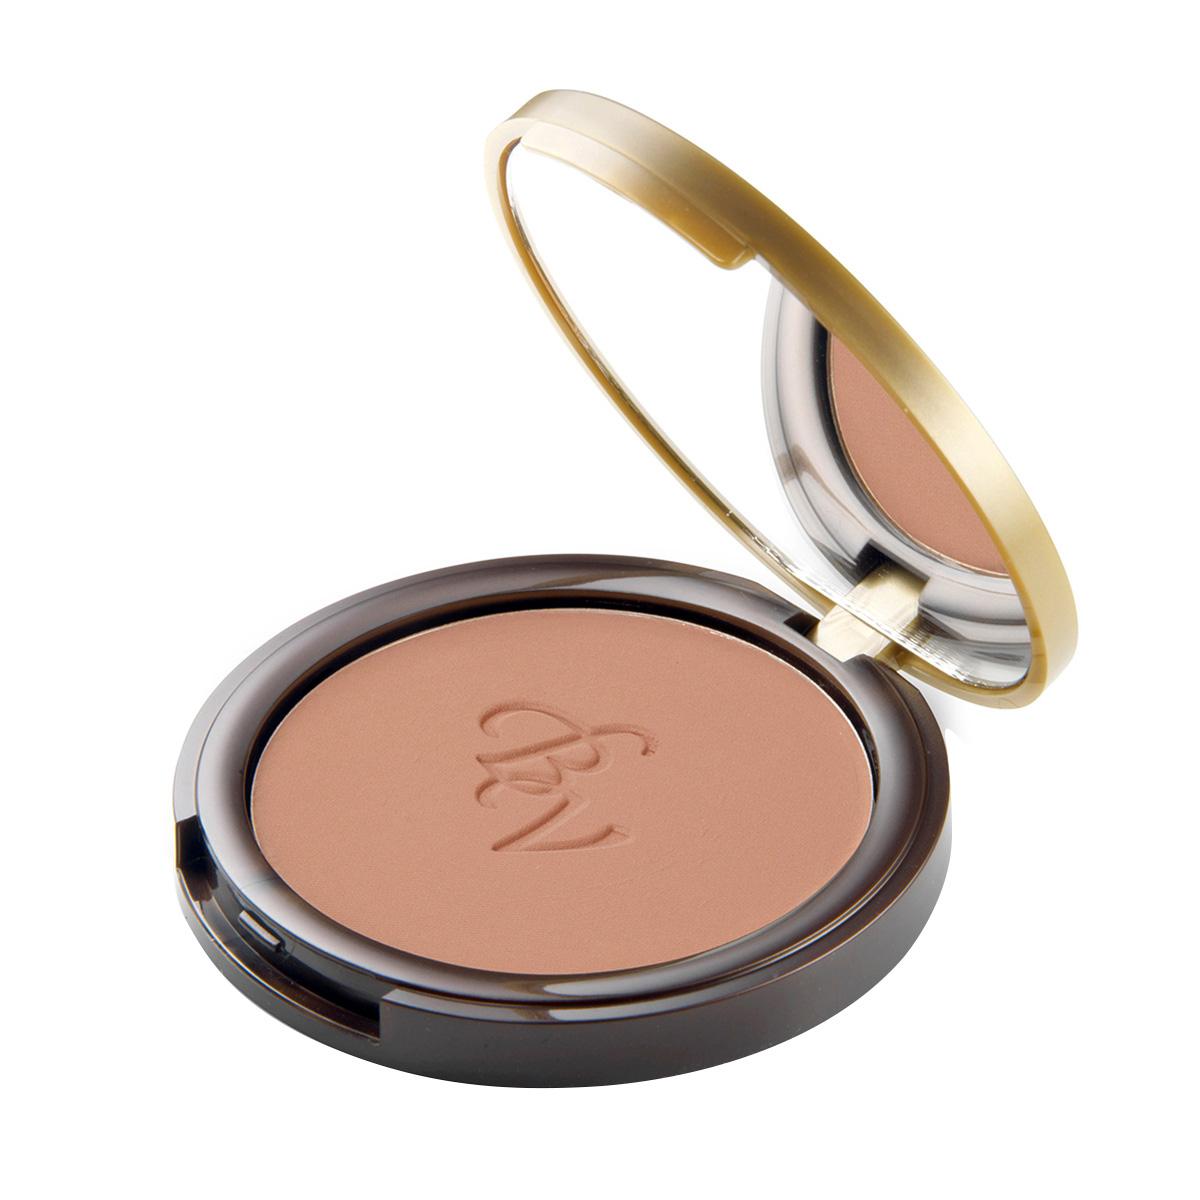 Pudra bronzanta, compacta, cu extract de camelie si vitamina E - pentru un rezultat natural